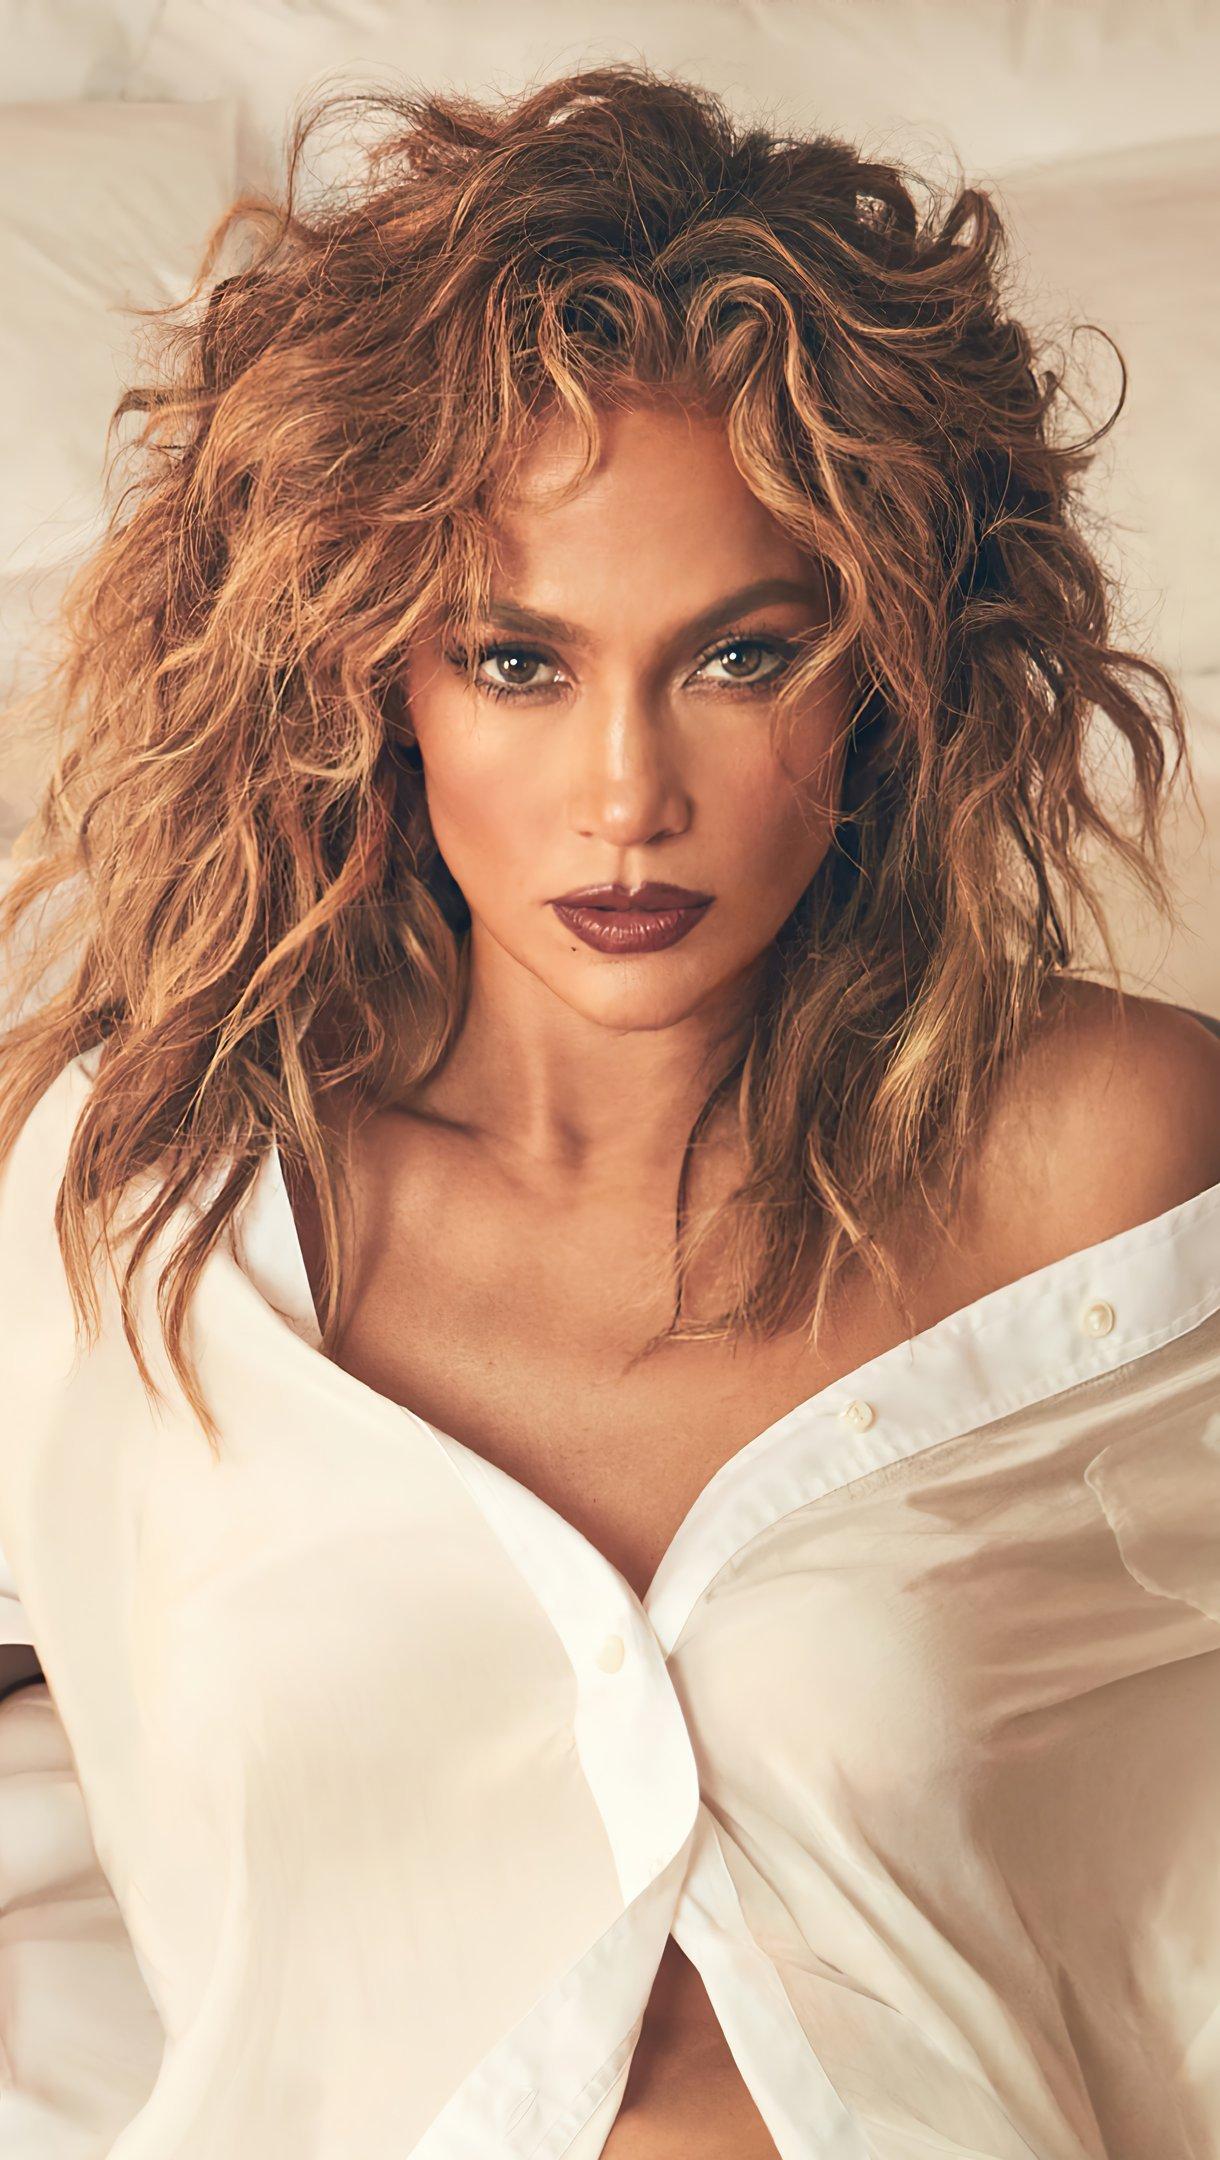 Wallpaper Jennifer Lopez in bed Vertical